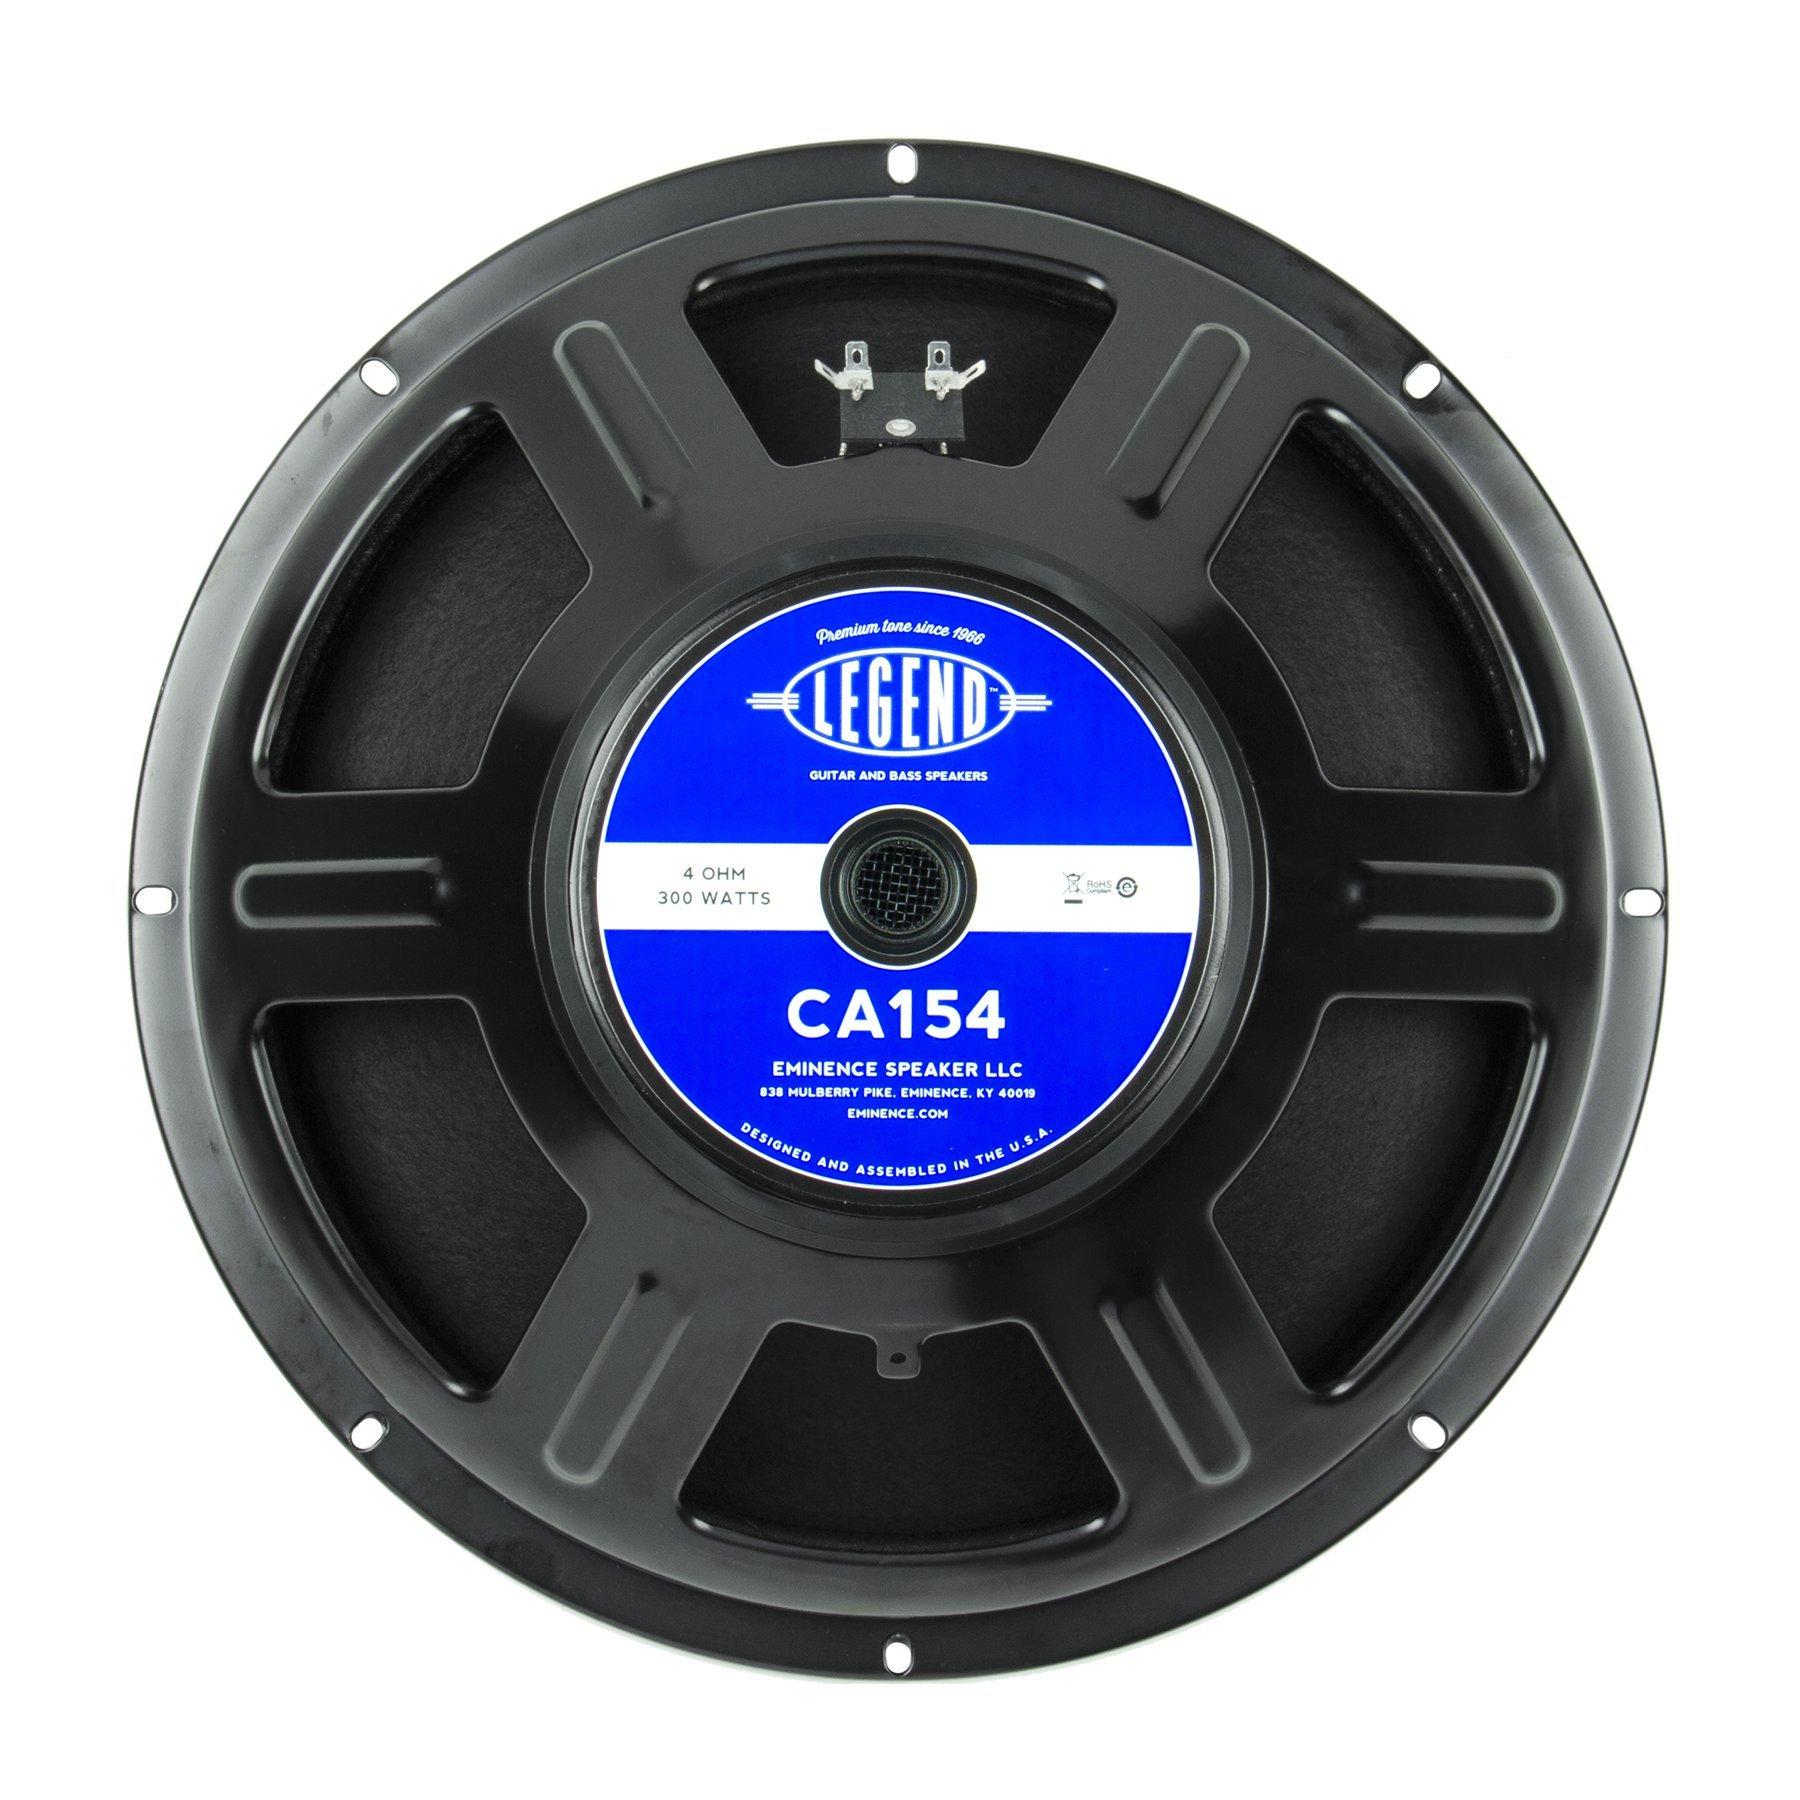 Eminence Legend CA154 15'' Bass Guitar Speaker, 300 Watts at 4 Ohms